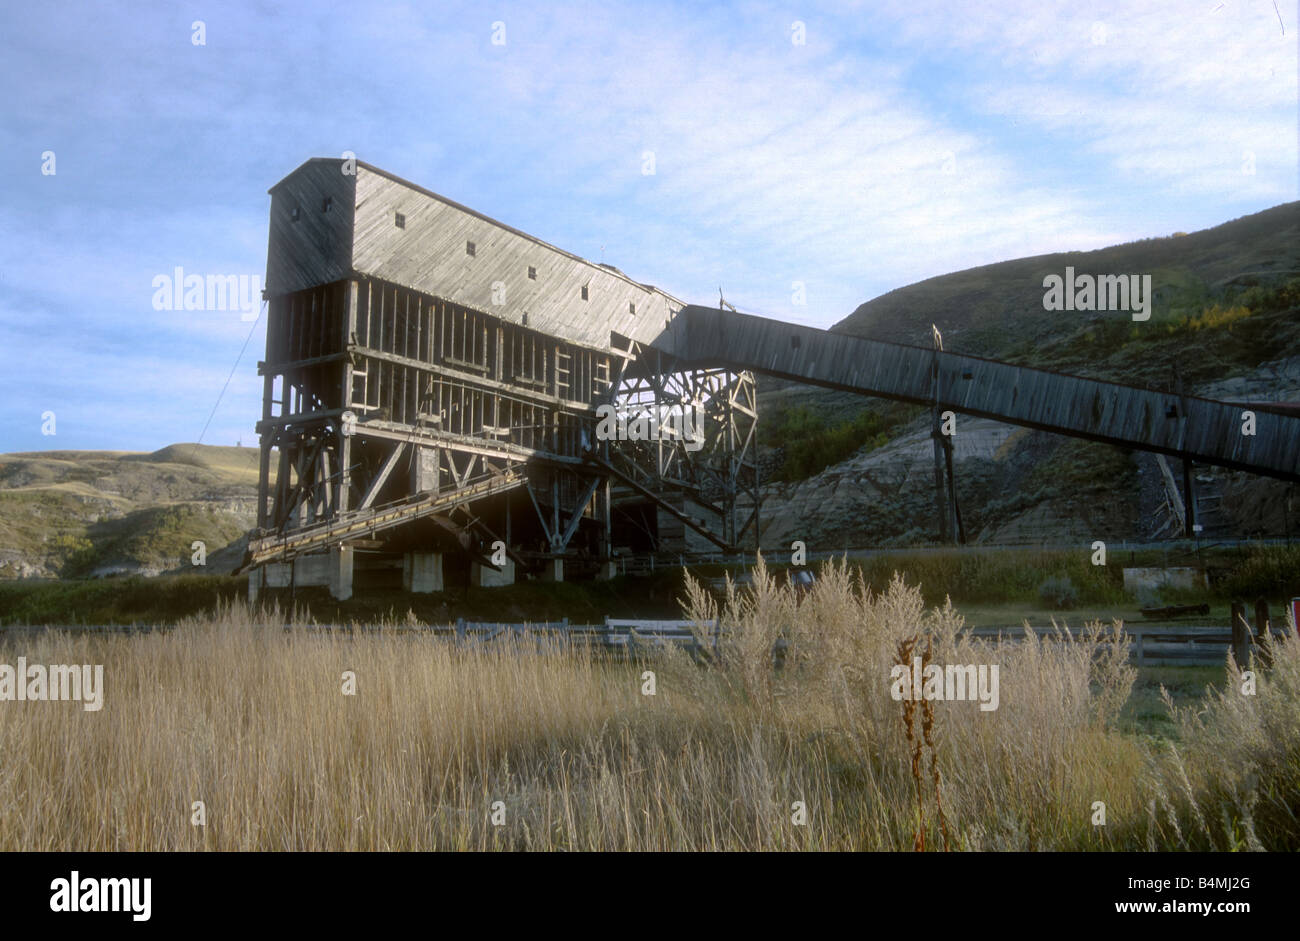 Atlas Coal Mine tipple - Stock Image